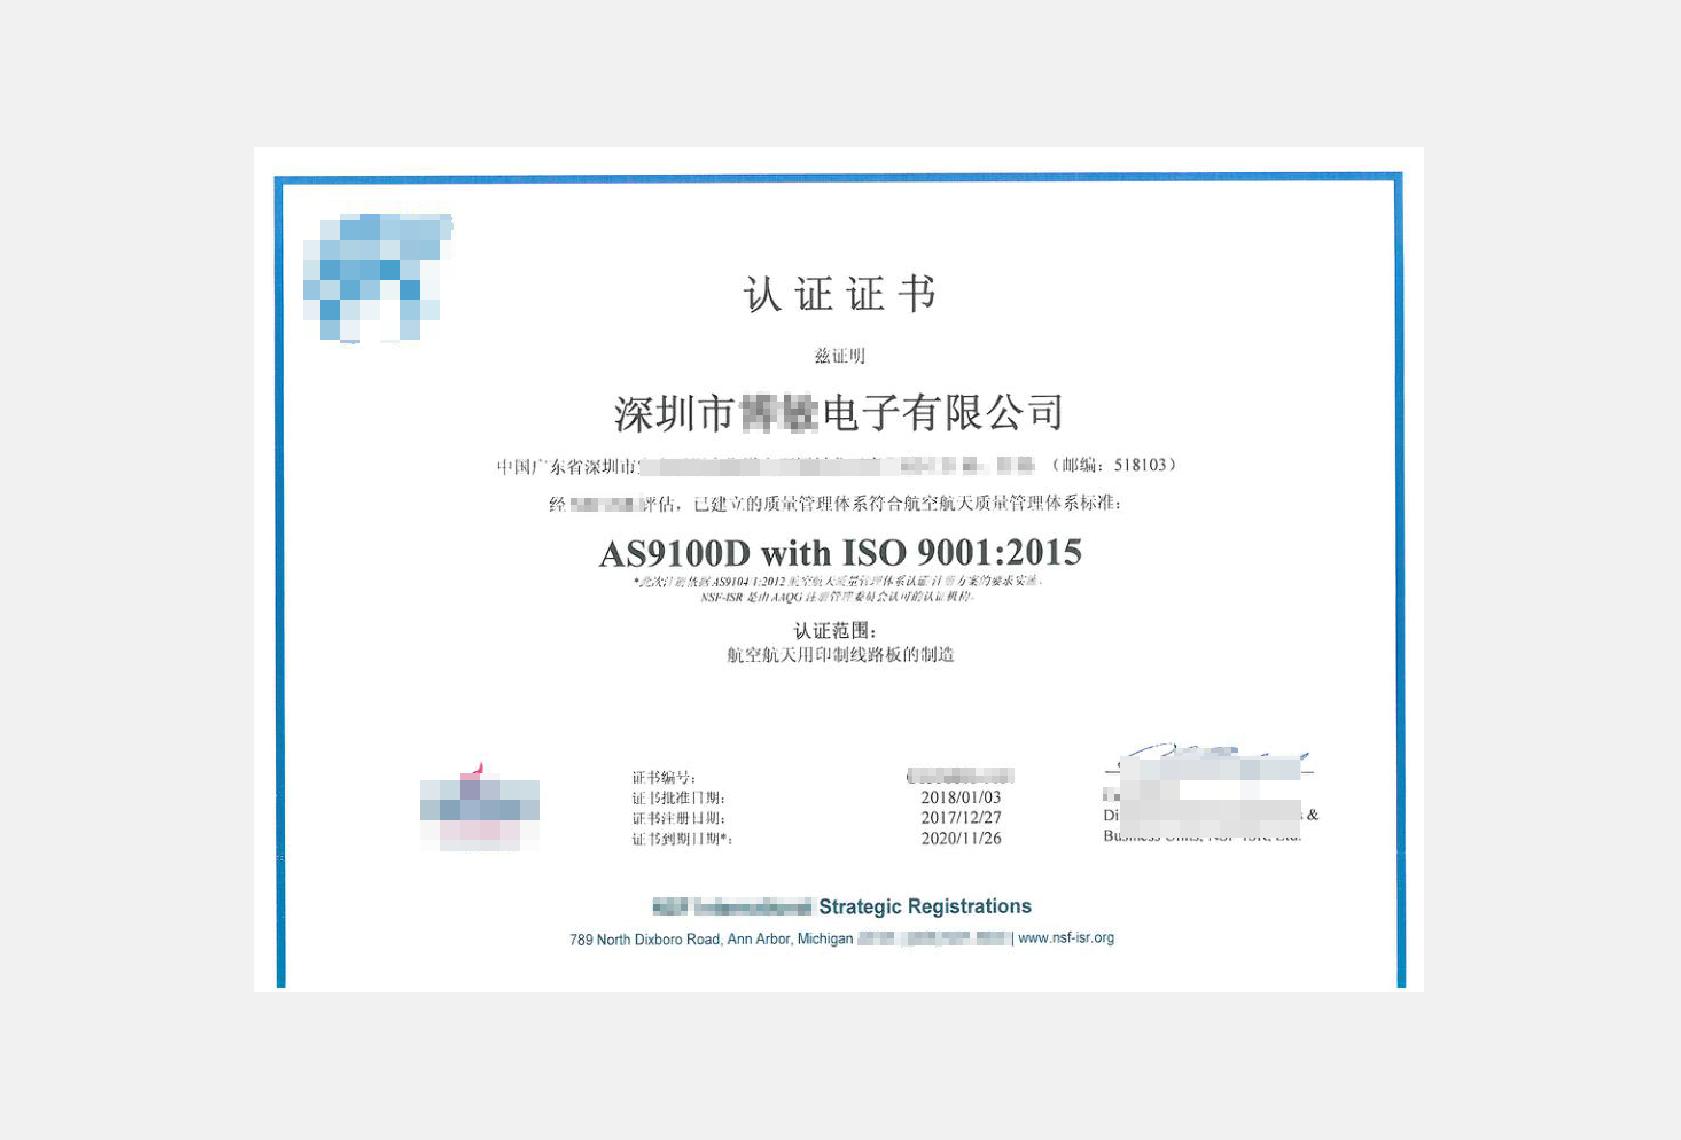 AS9100航天航空质量管理体系证书